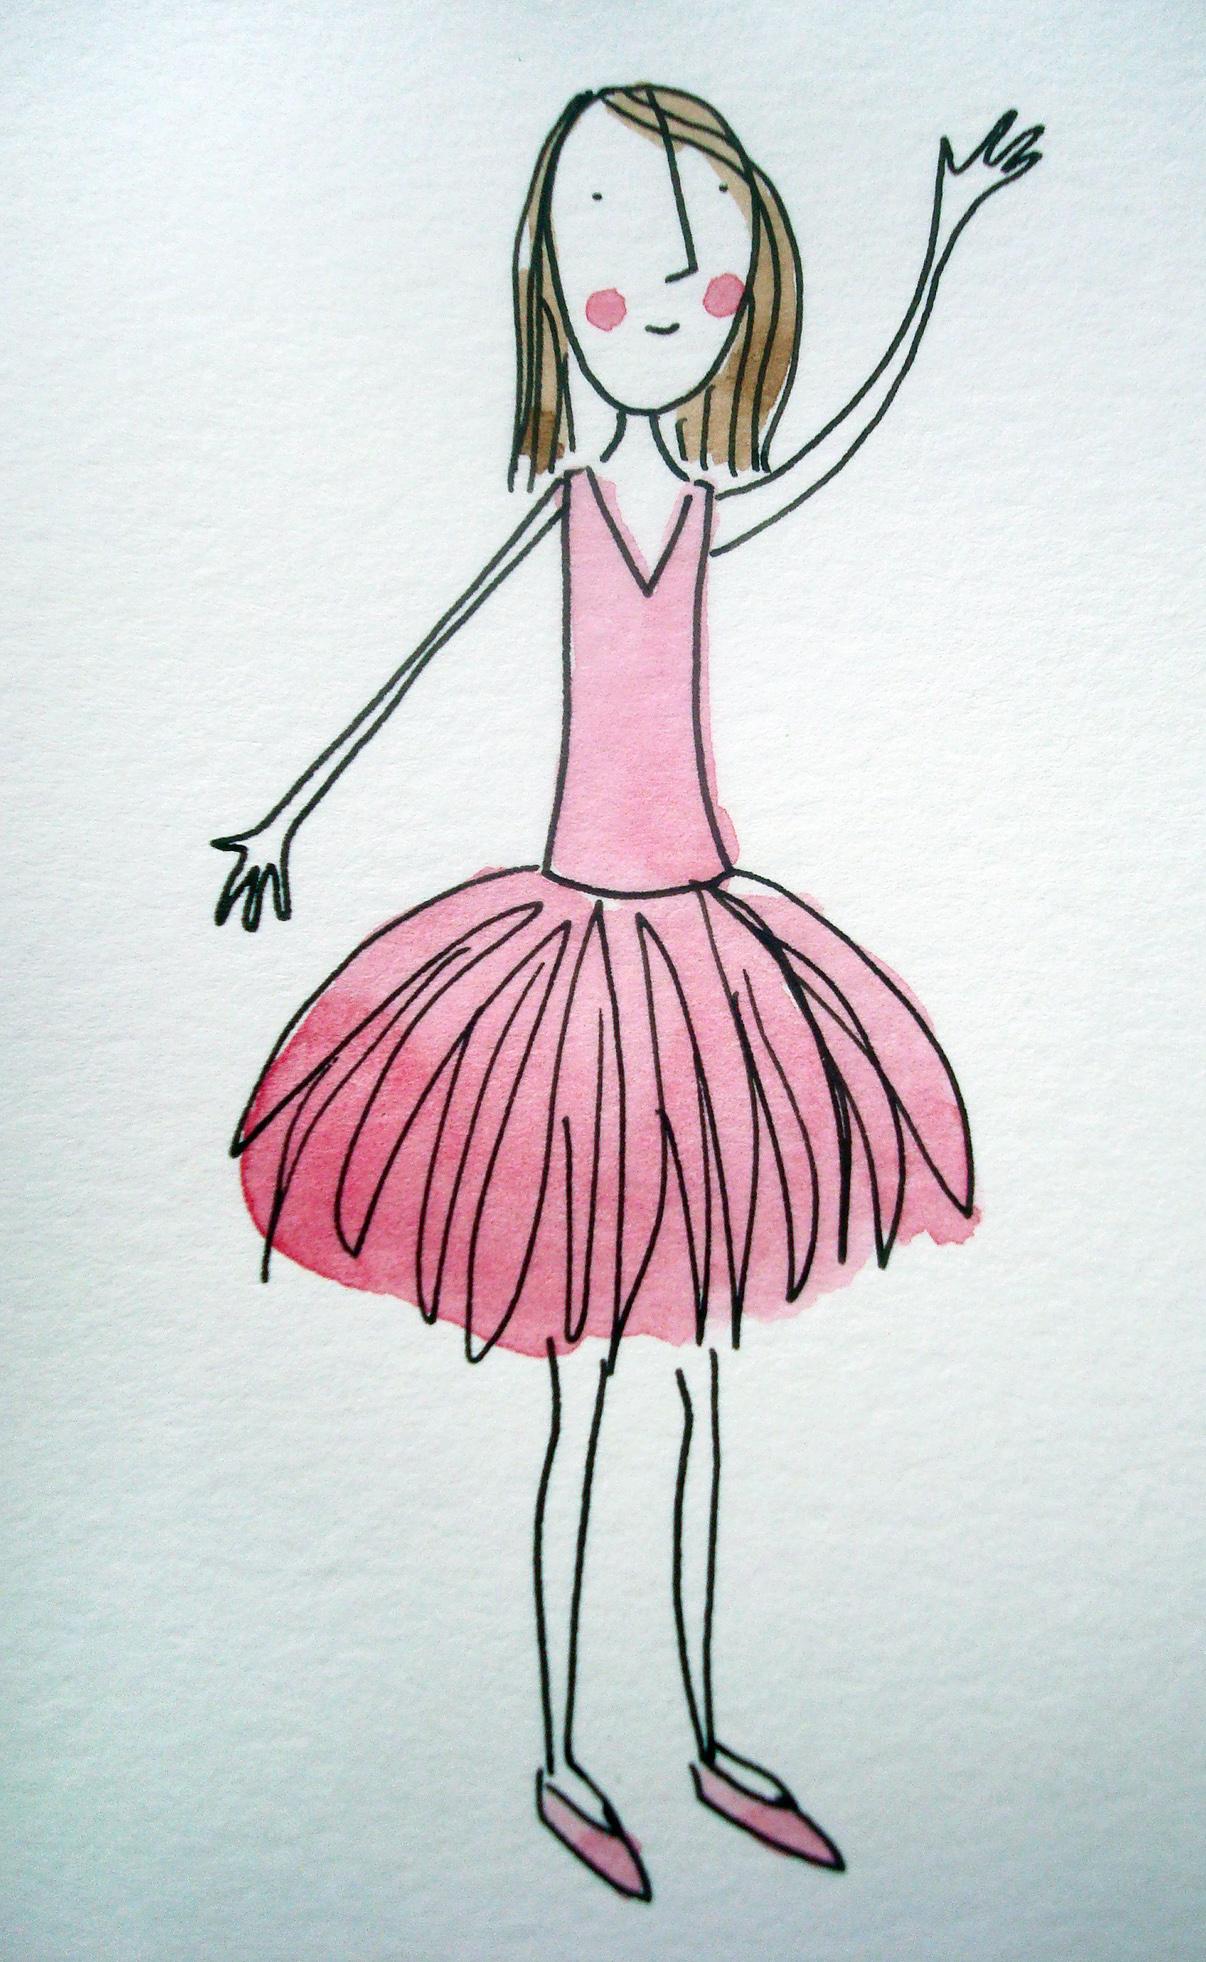 How to illustrate feathery tutu